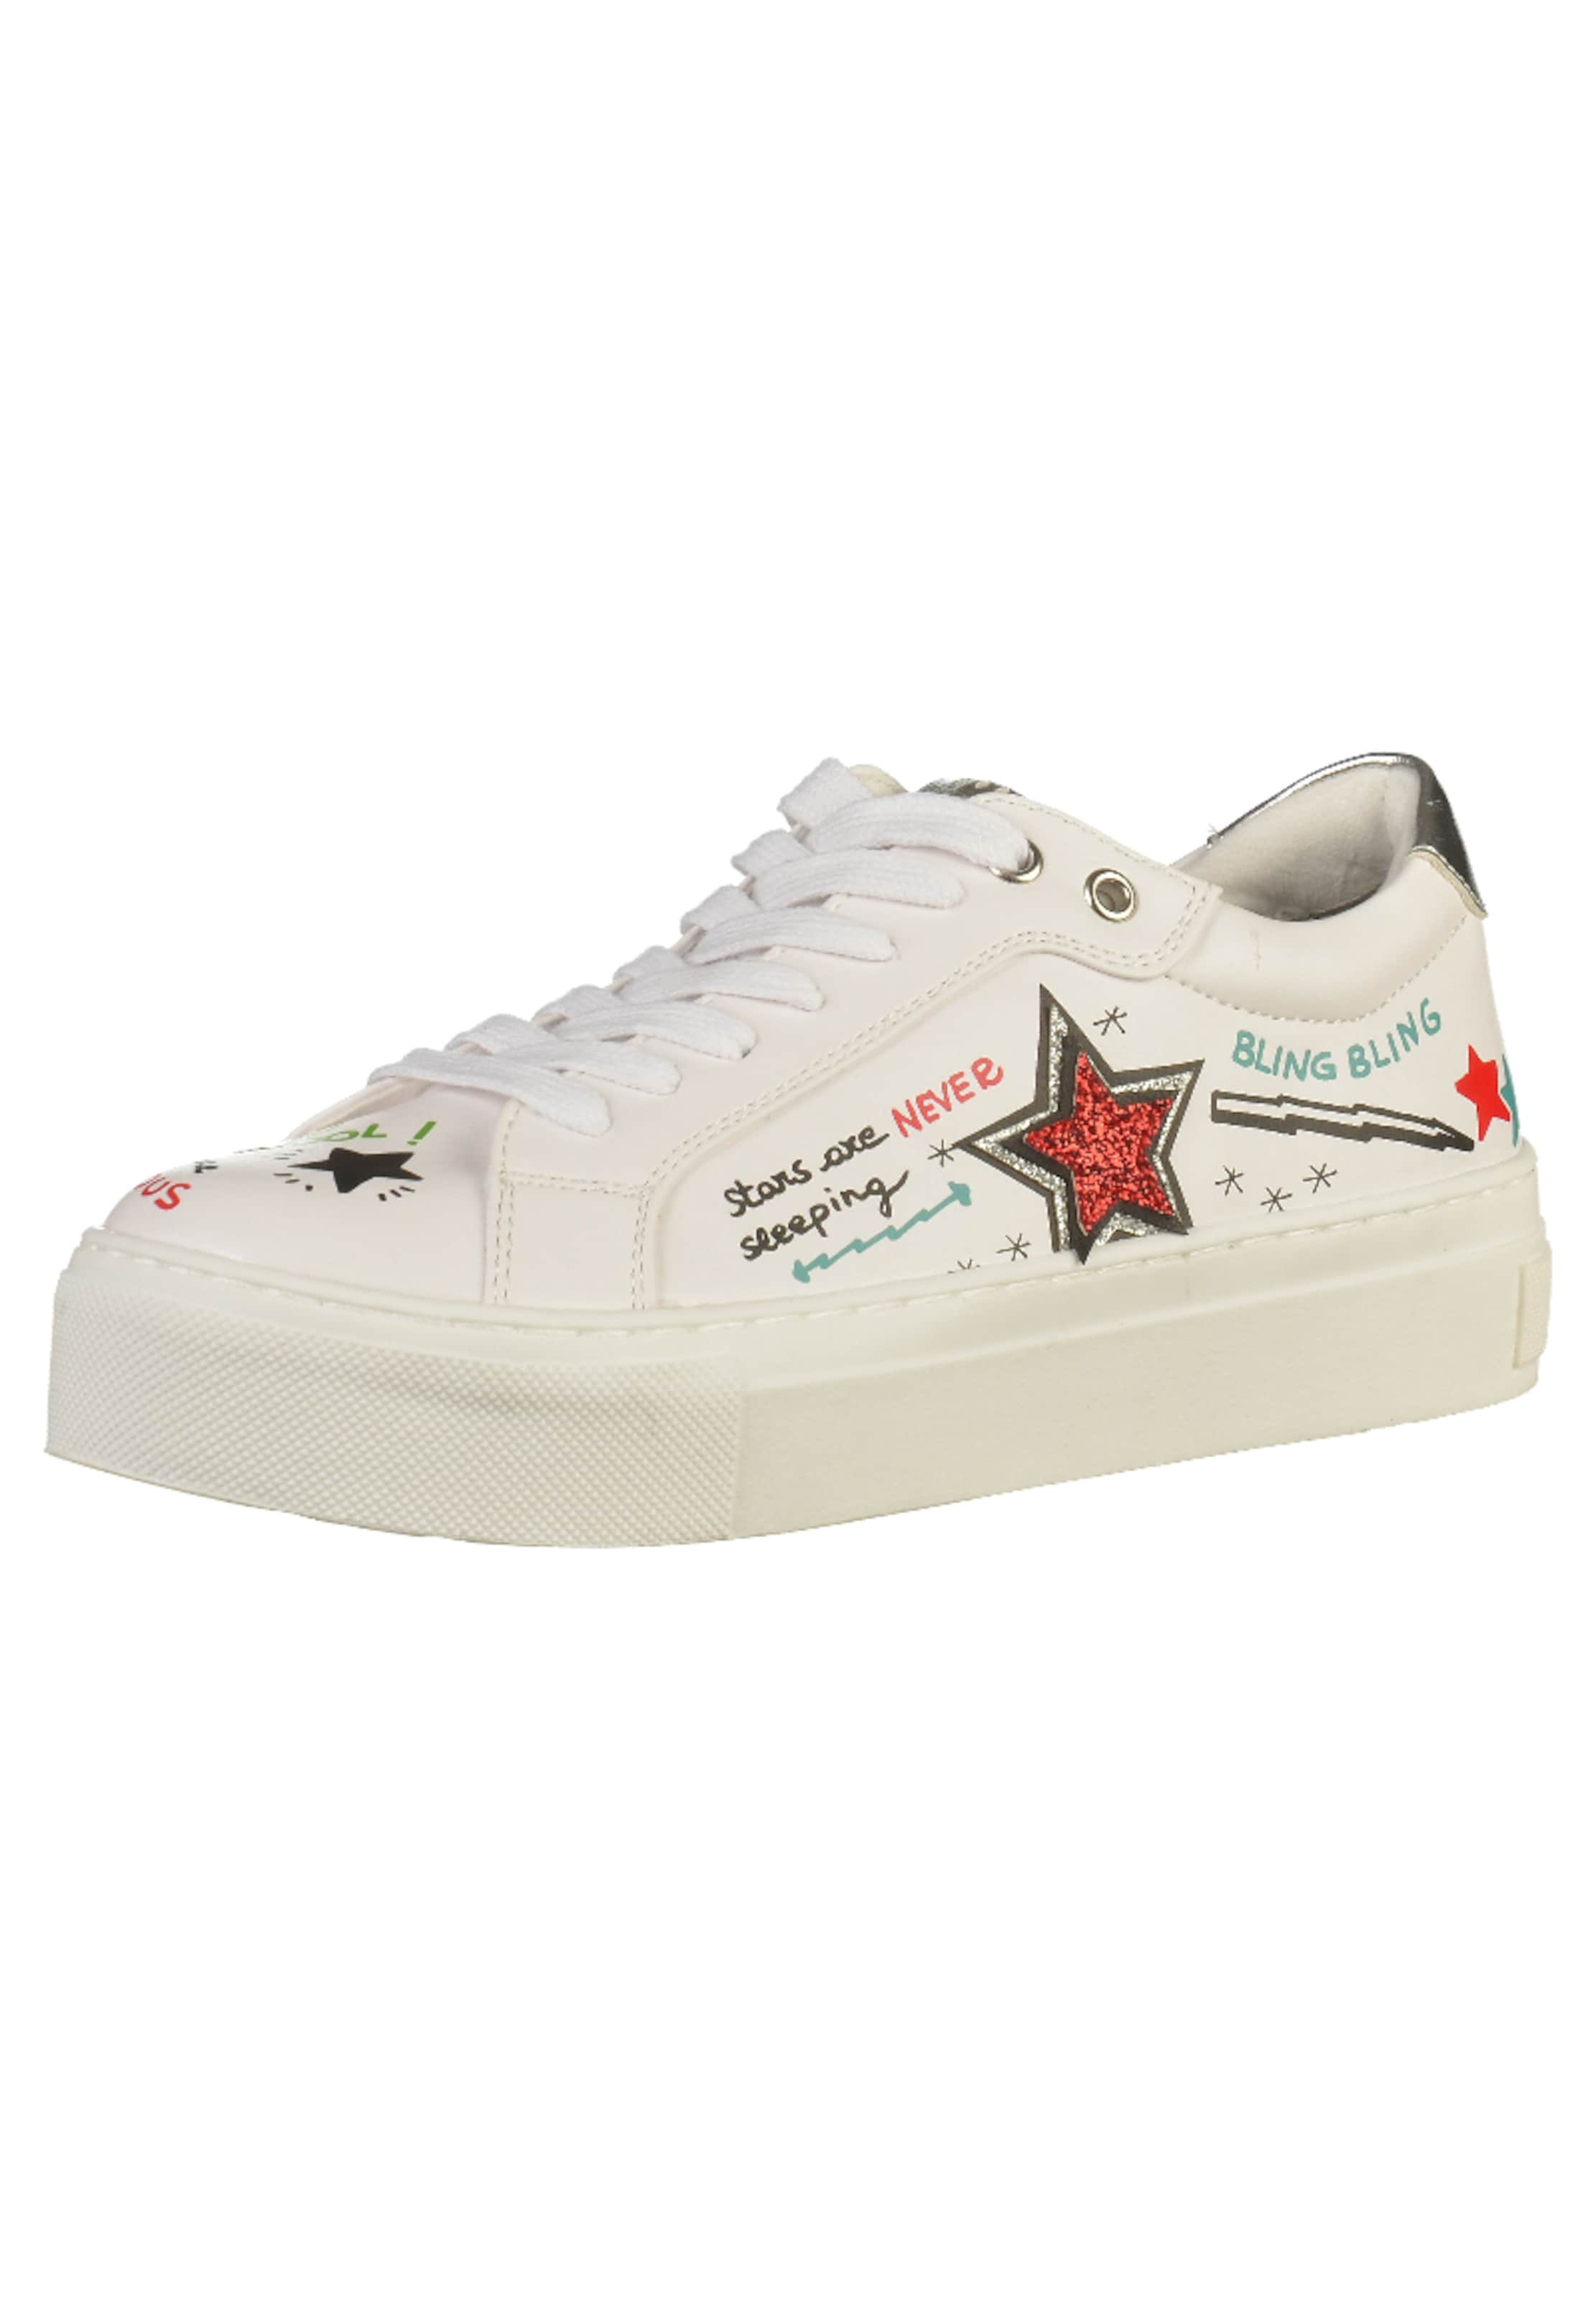 MARCO TOZZI Sneaker Verschleißfeste billige Schuhe